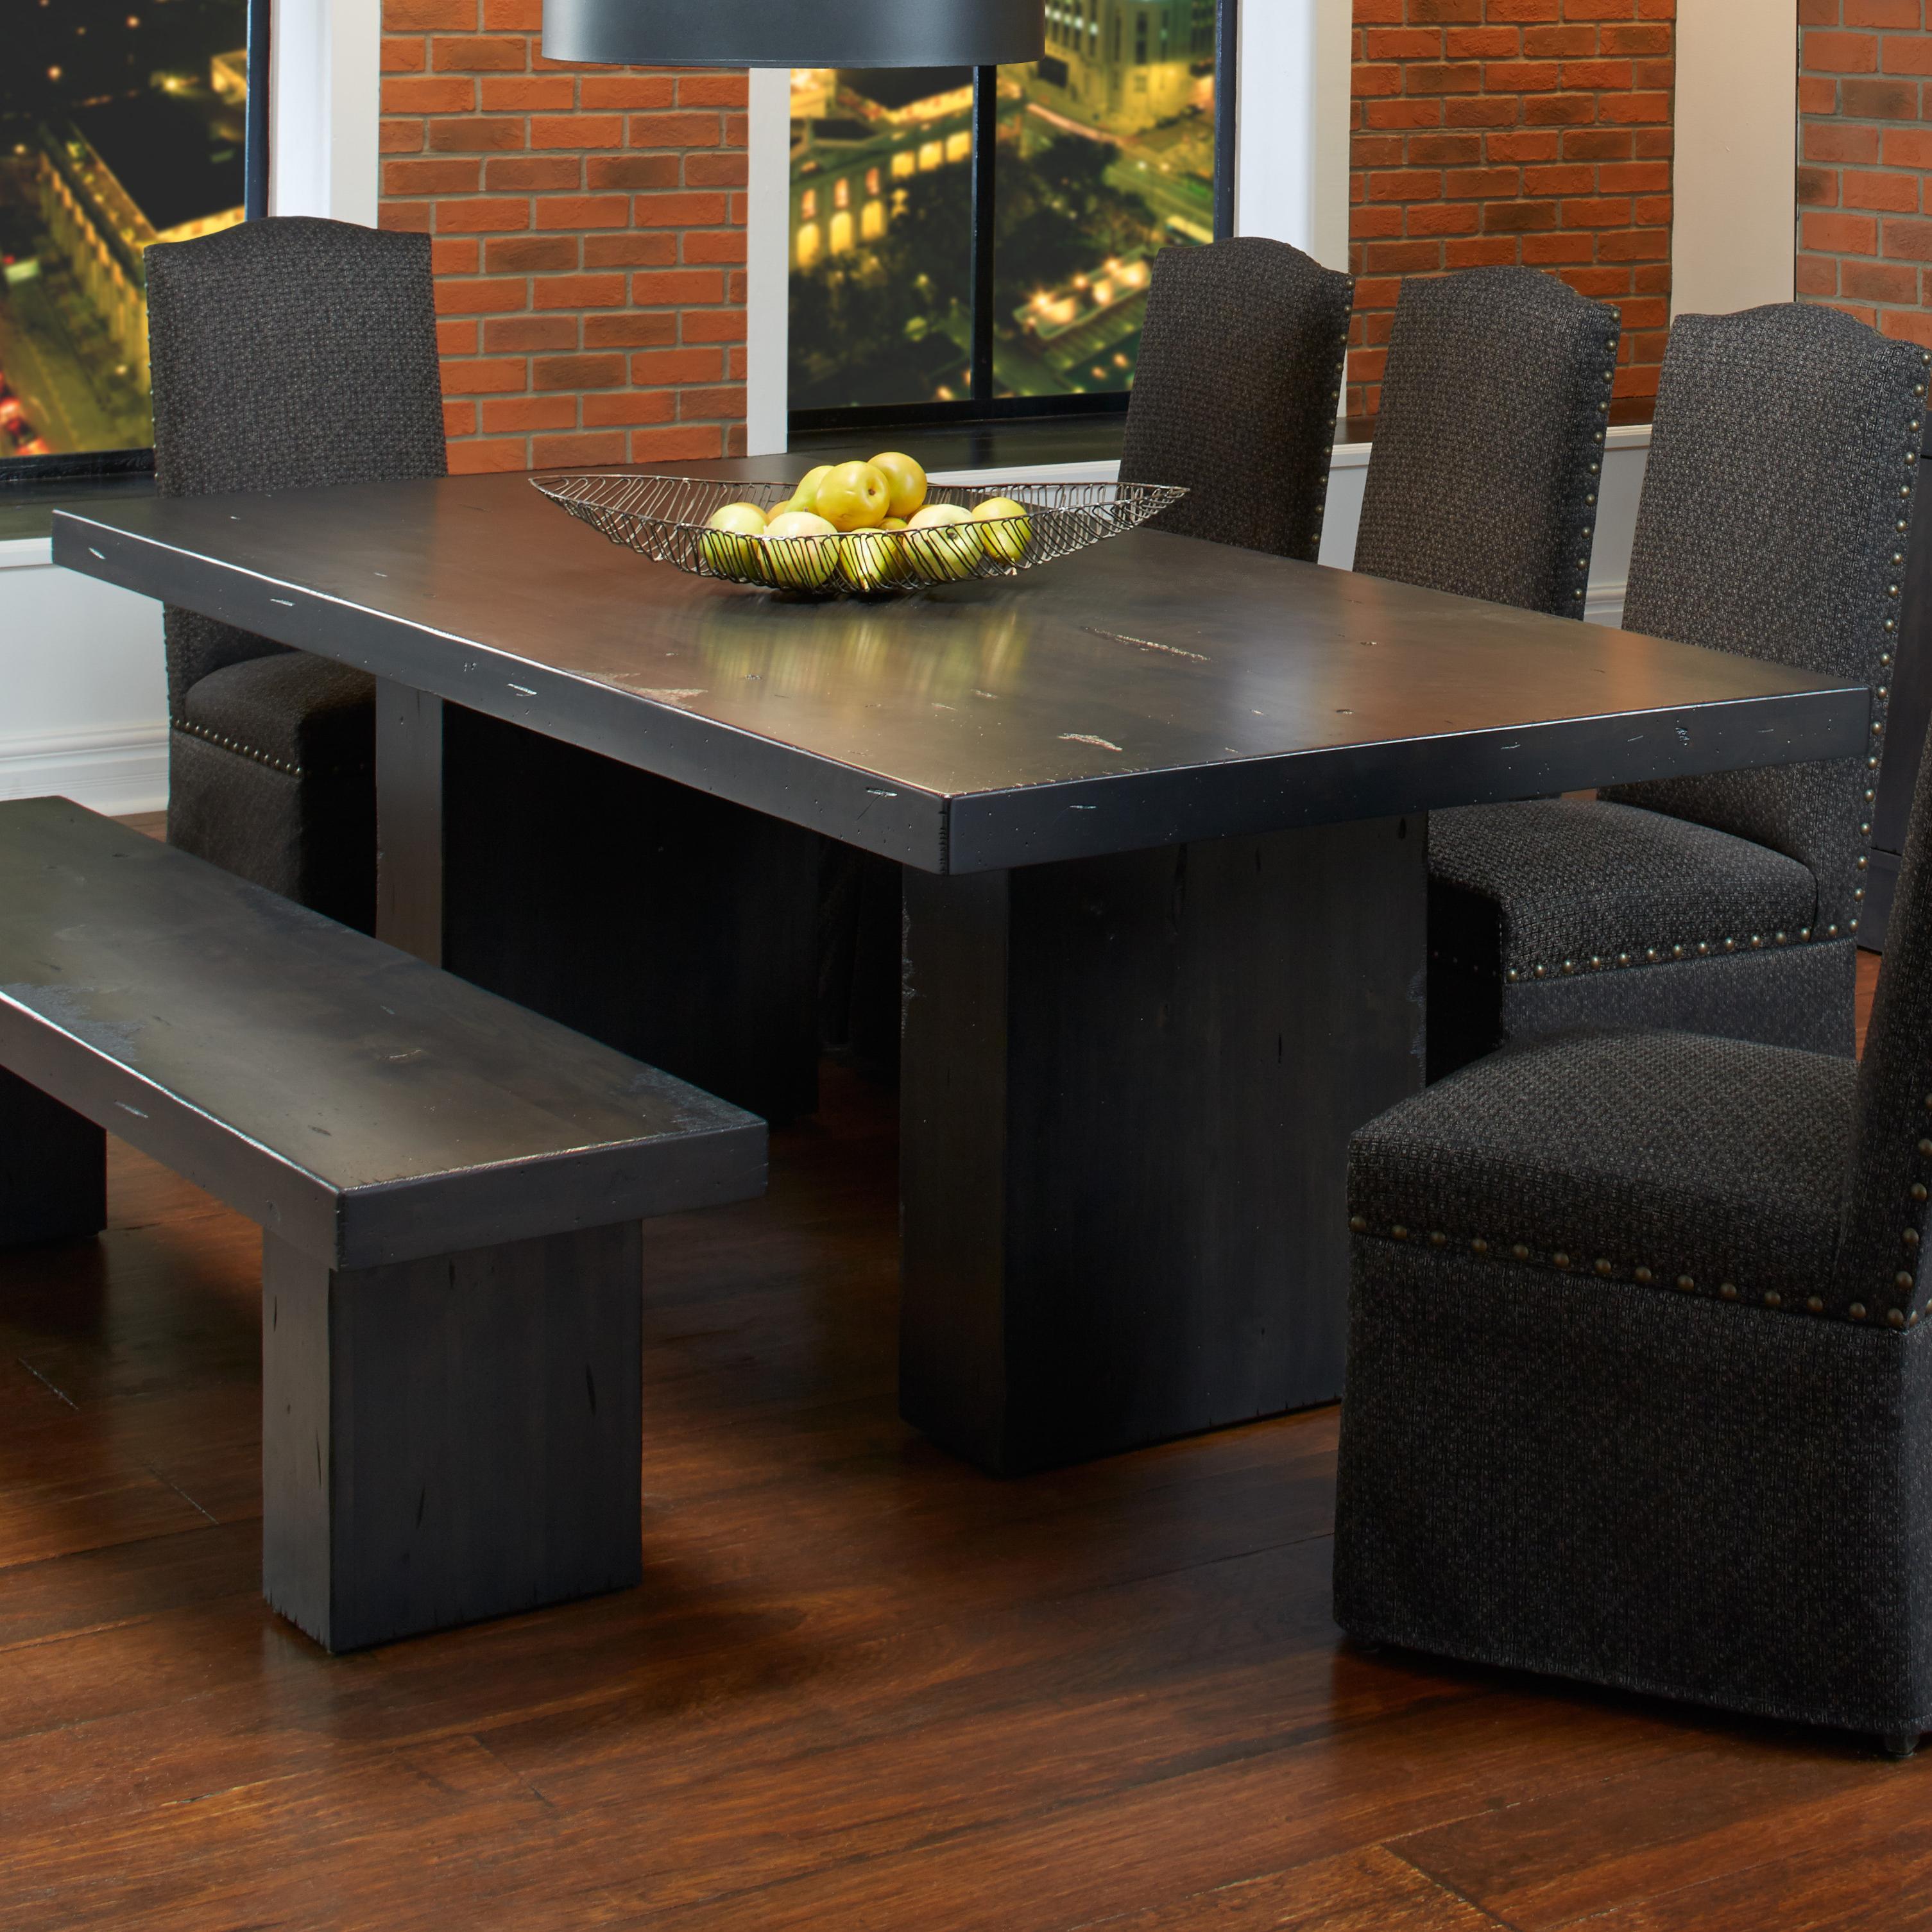 canadel loft custom dining customizable rectangular table with double pedestal base belfort. Black Bedroom Furniture Sets. Home Design Ideas